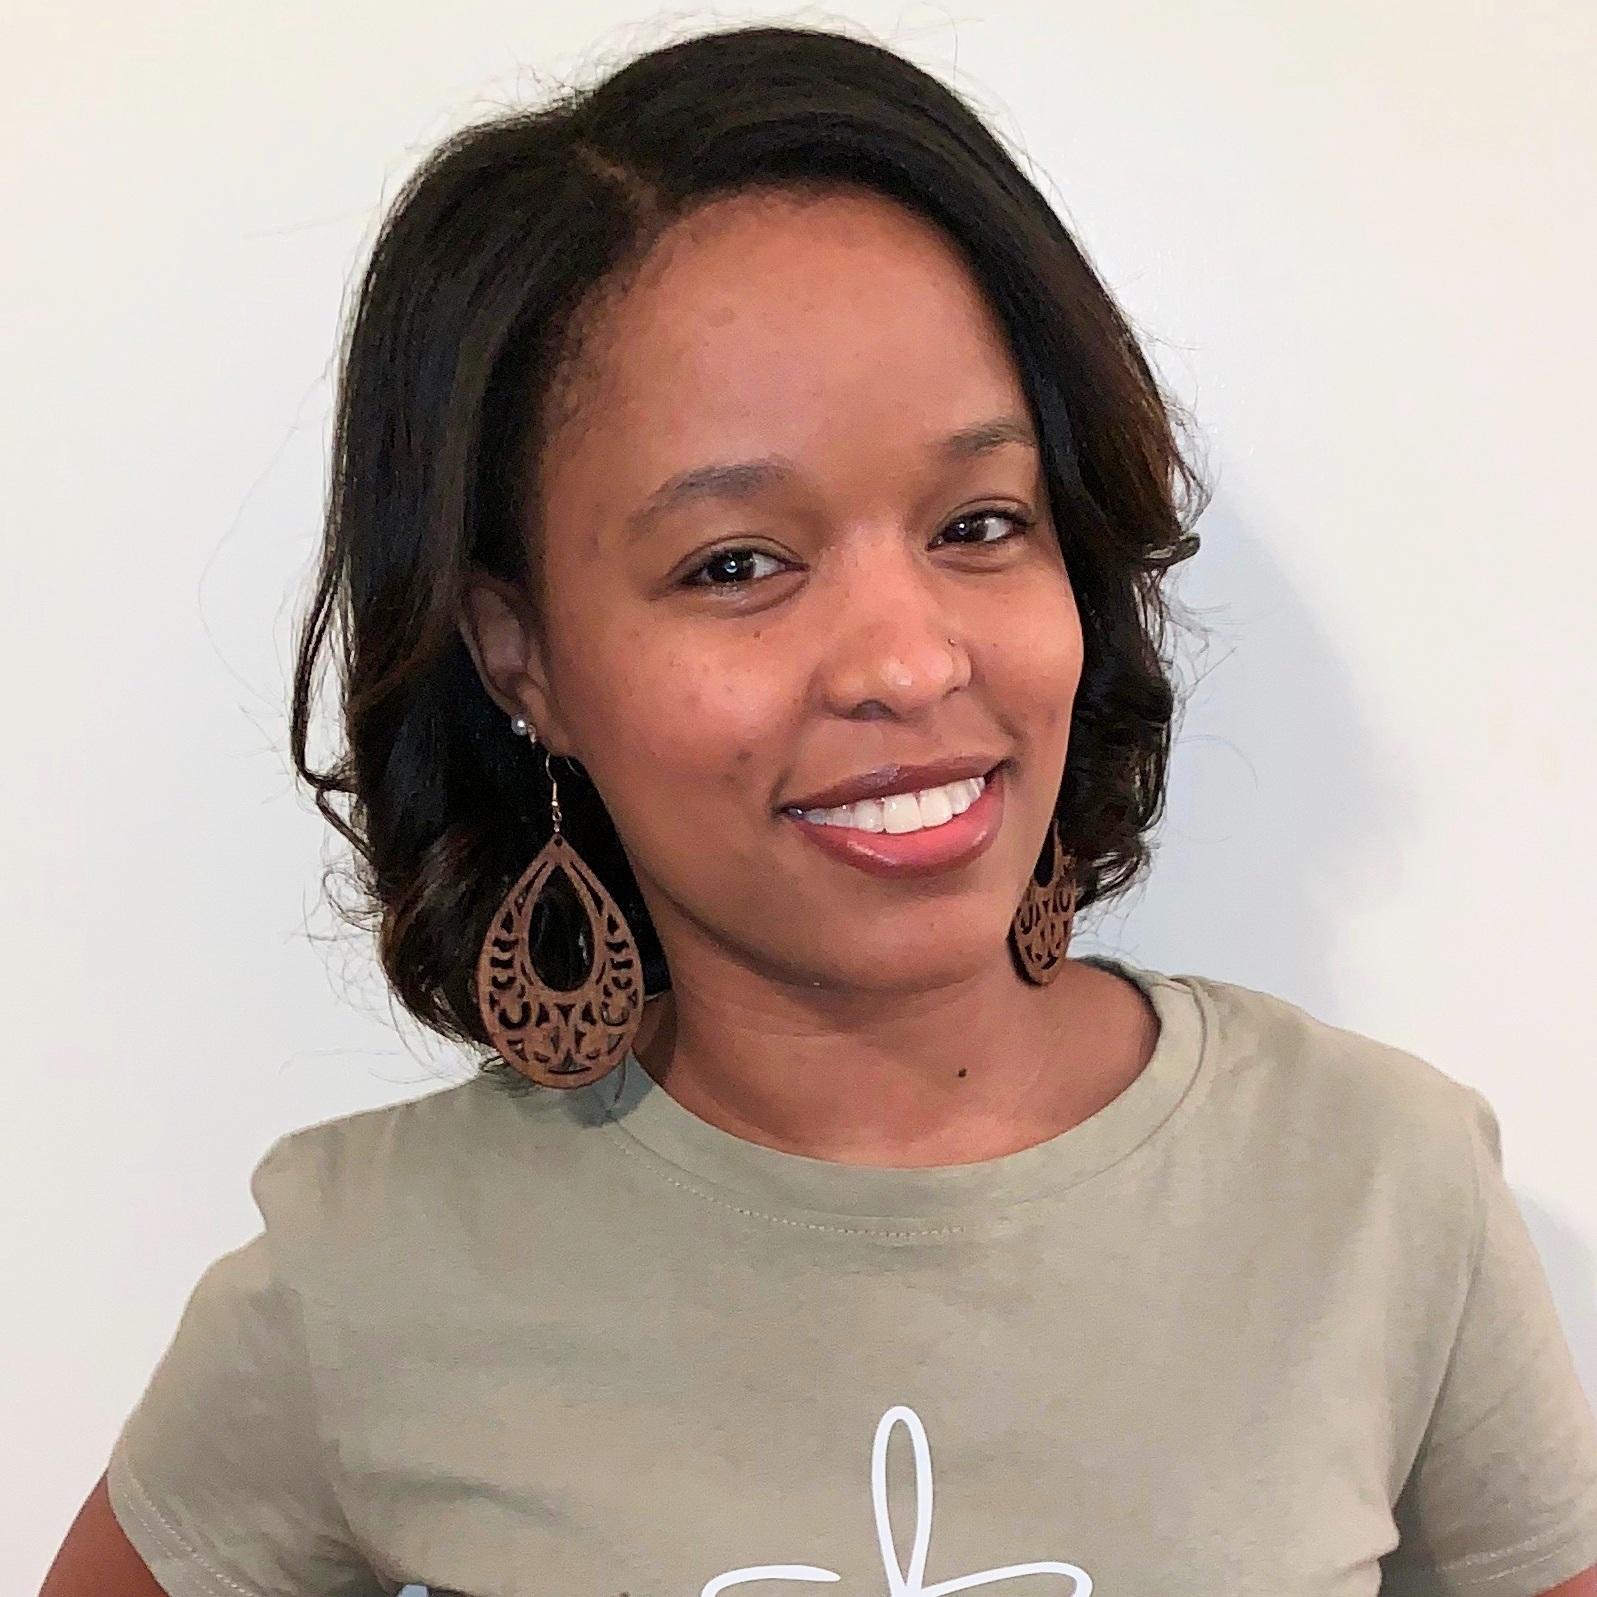 Meashel Mason, Associate Producer